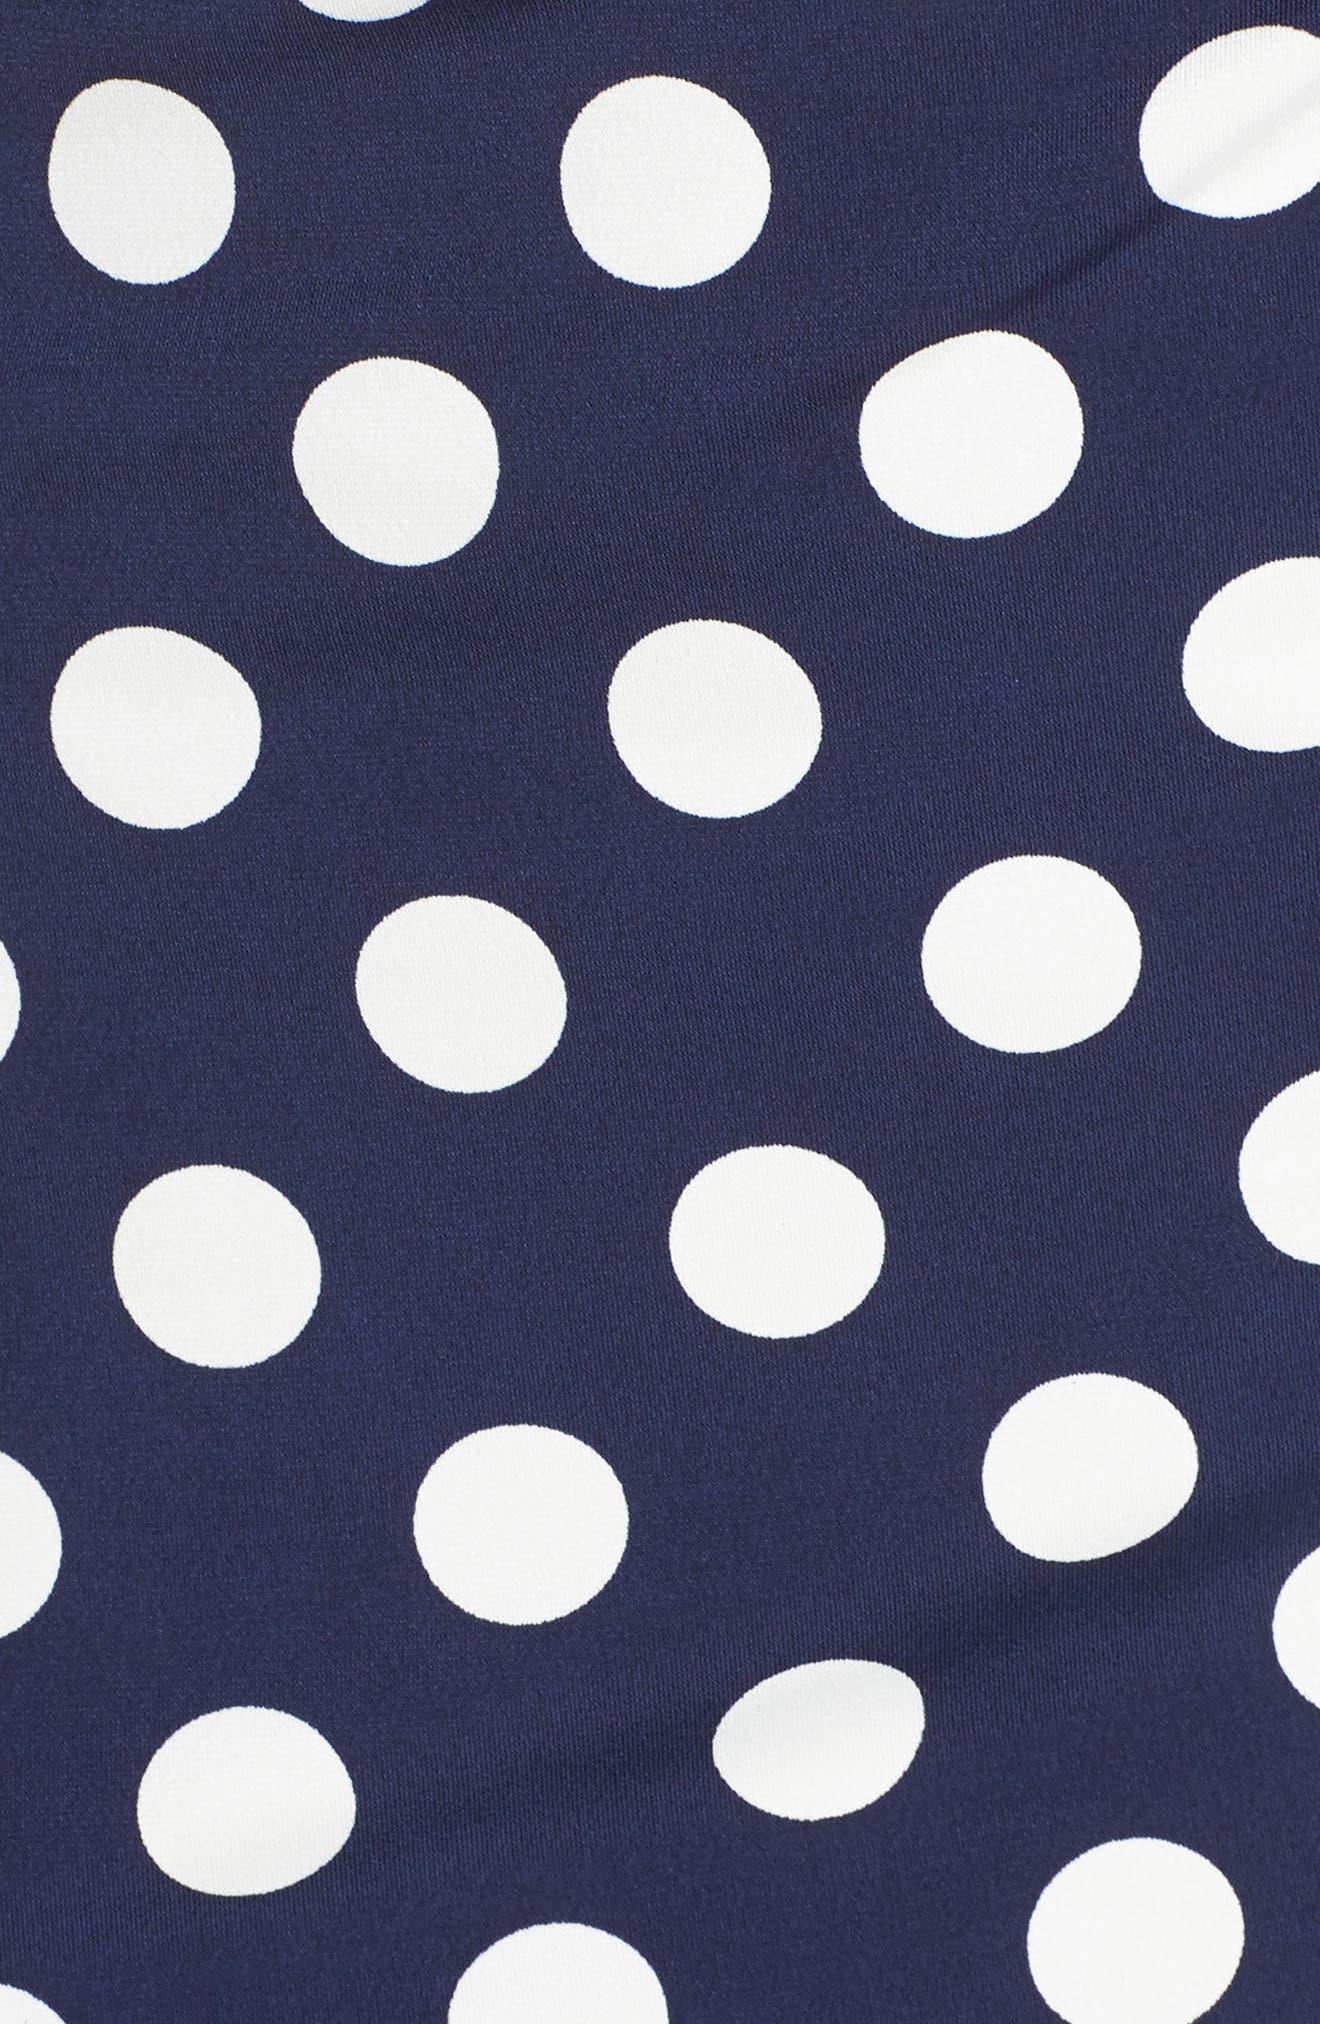 Polka Dot Side Twist Sheath Dress,                             Alternate thumbnail 6, color,                             407